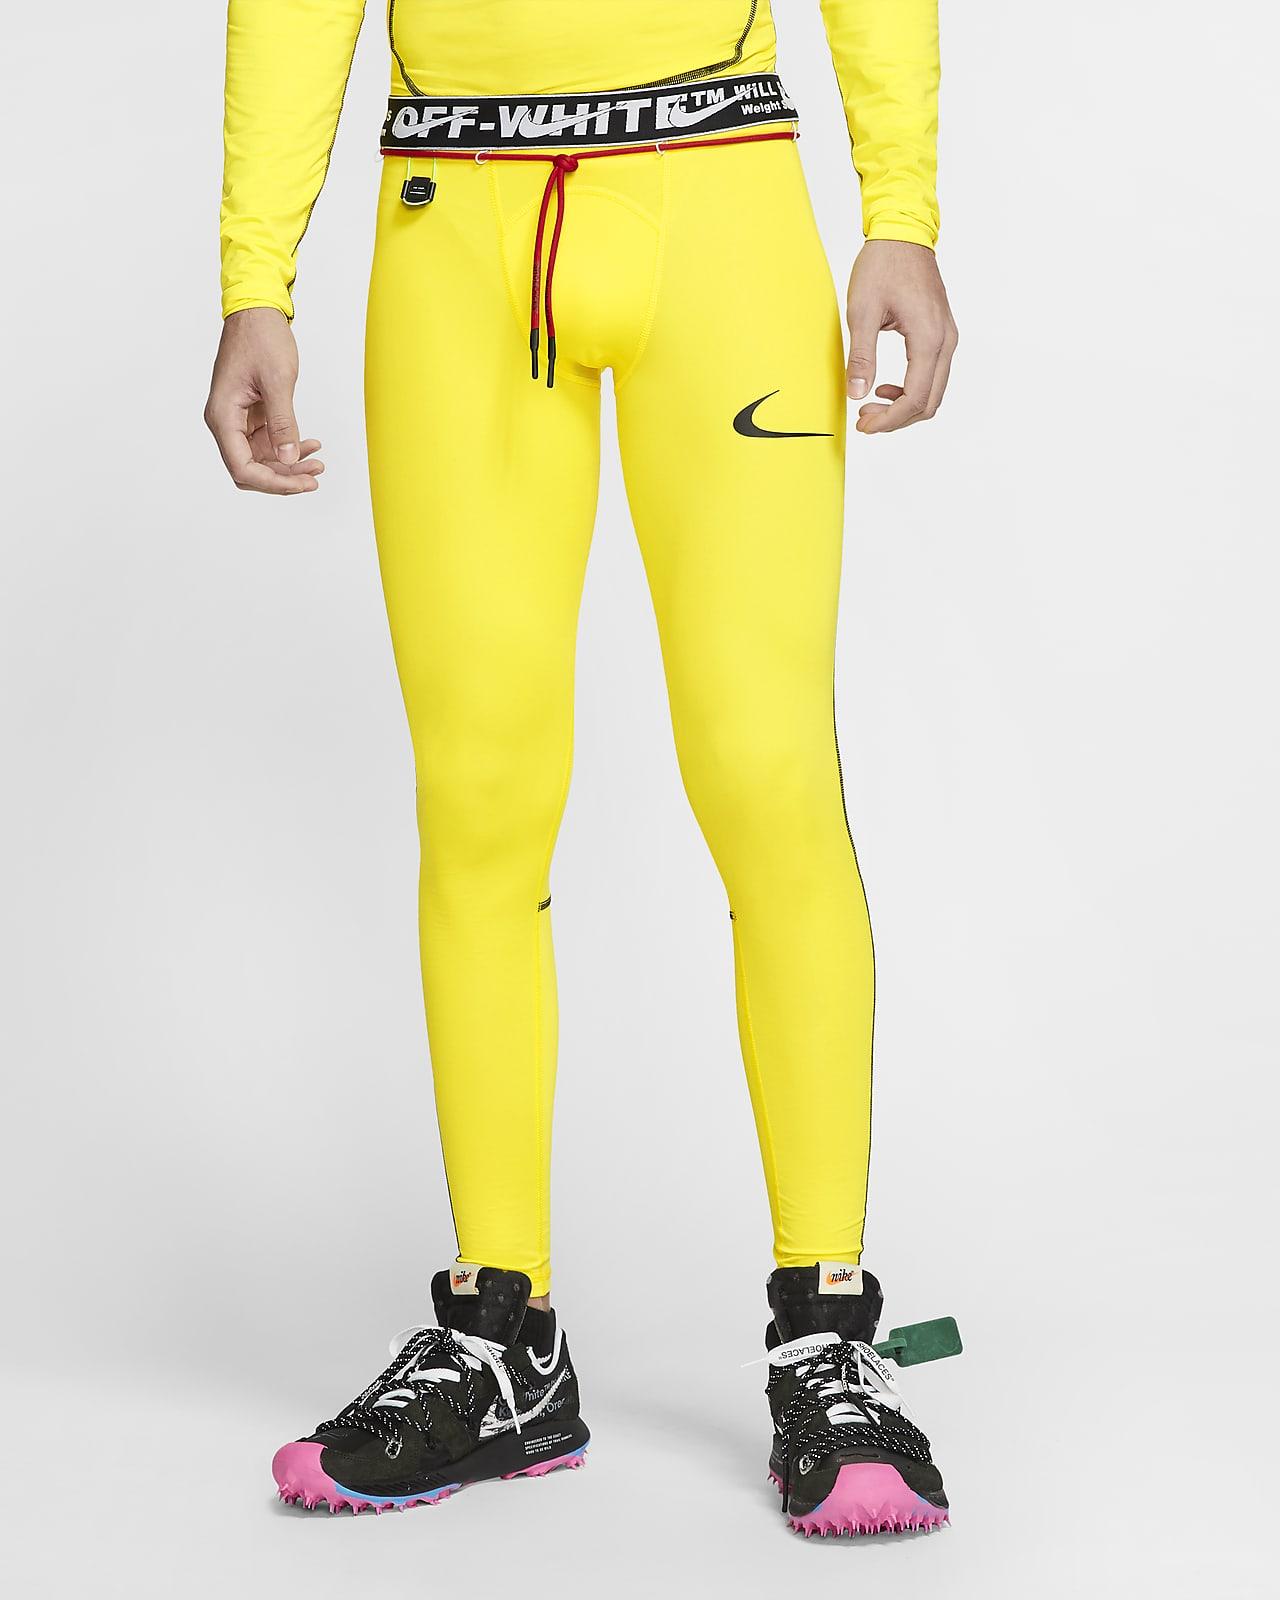 Off-White™ Pro Men's Tights. Nike JP